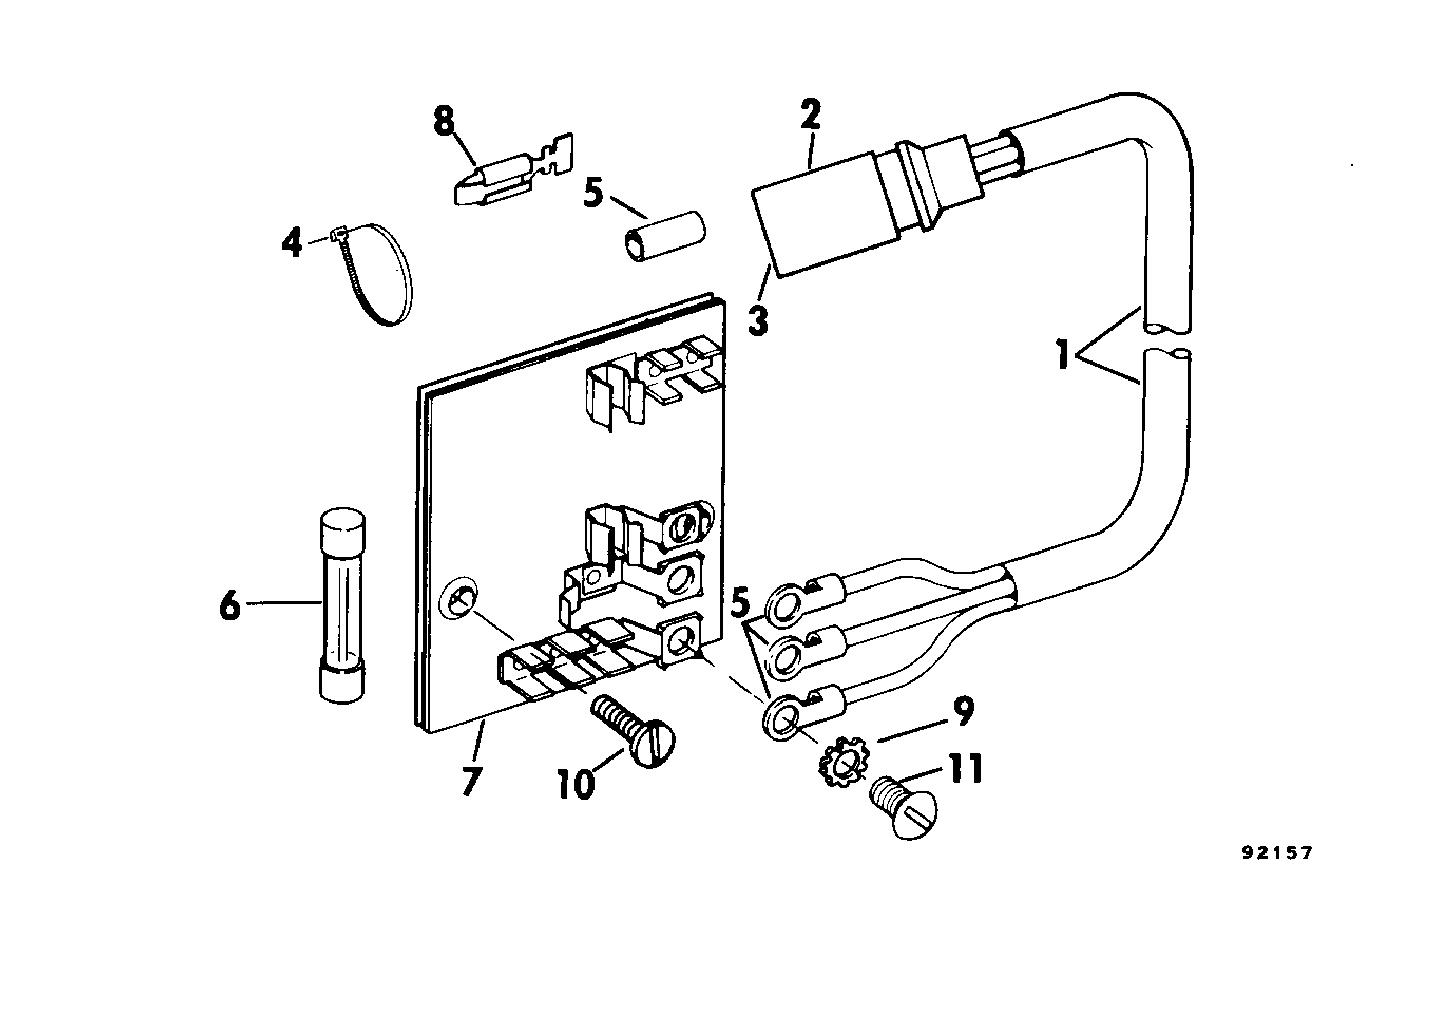 hight resolution of omc kill switch wiring diagram mercruiser throttle control